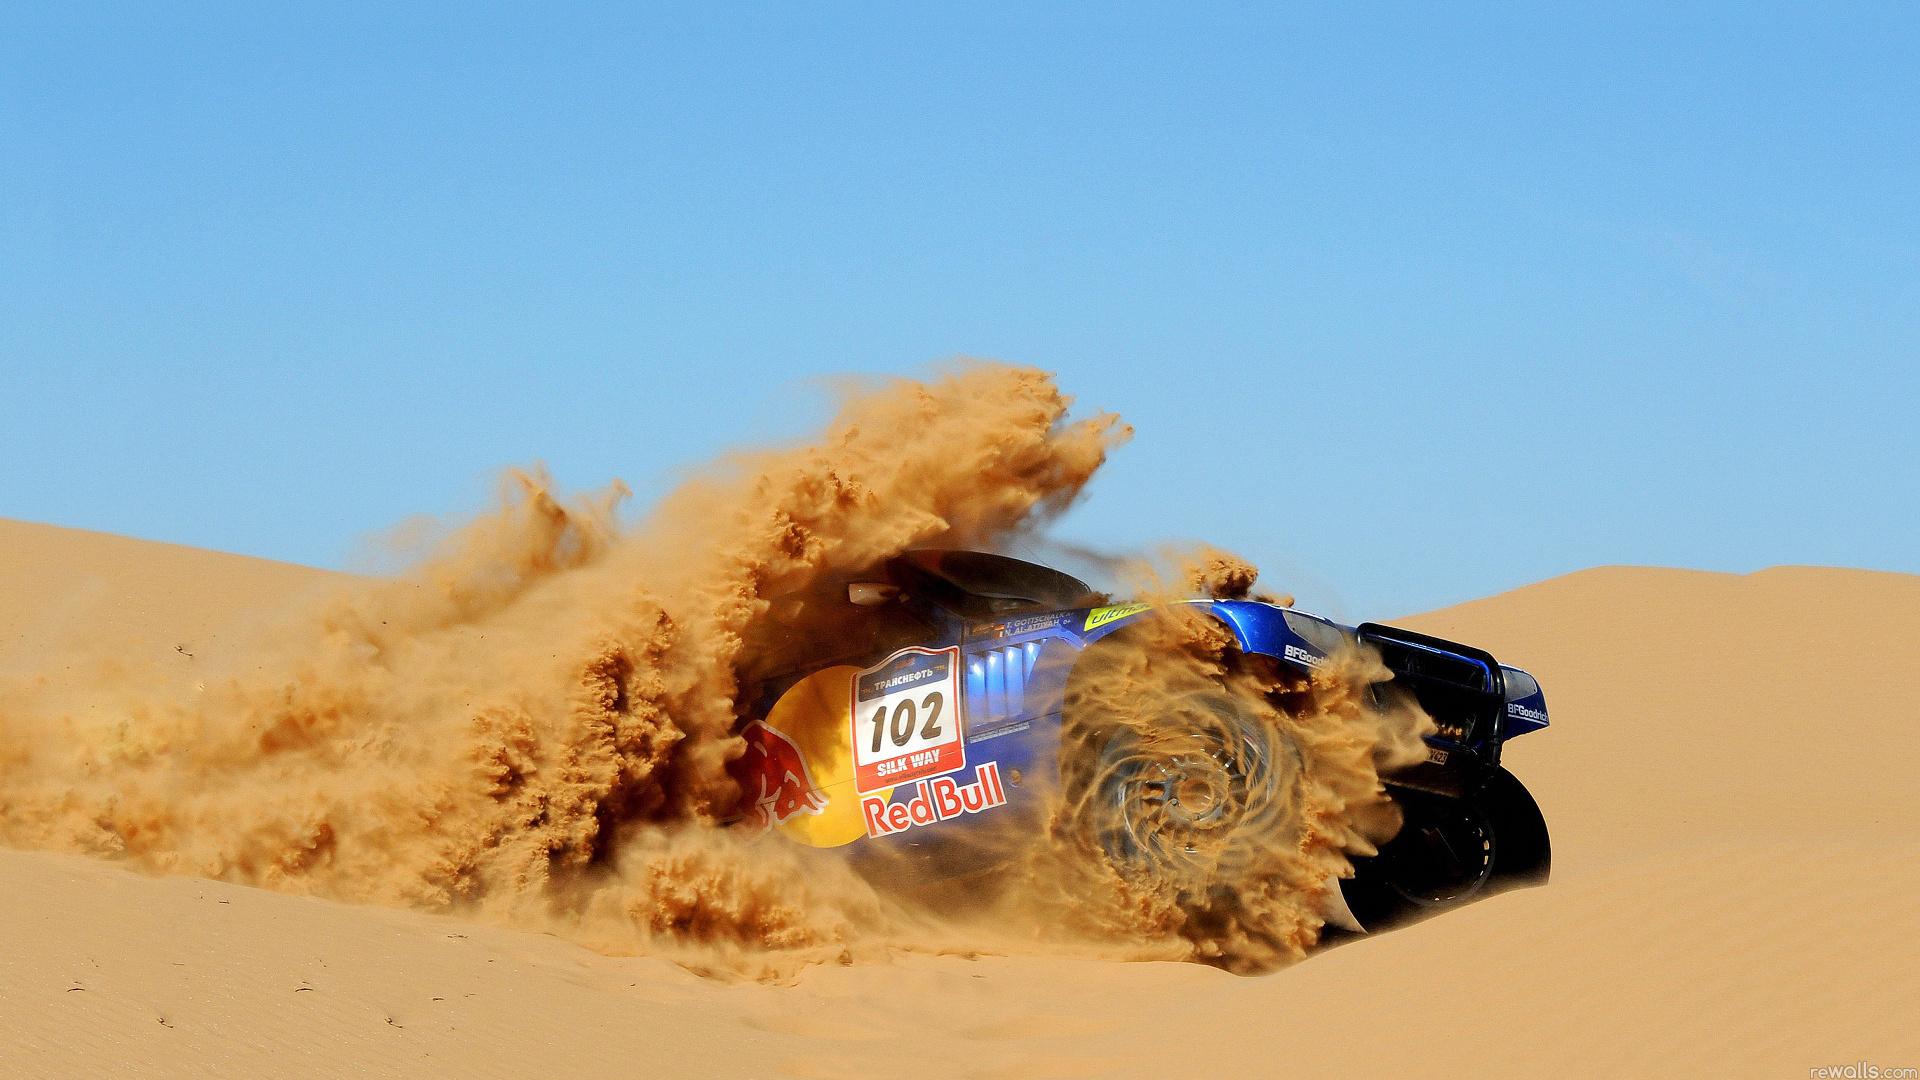 Дакар, пустыня, скачать фото, машина, rally Dakar, обои на рабочий стол